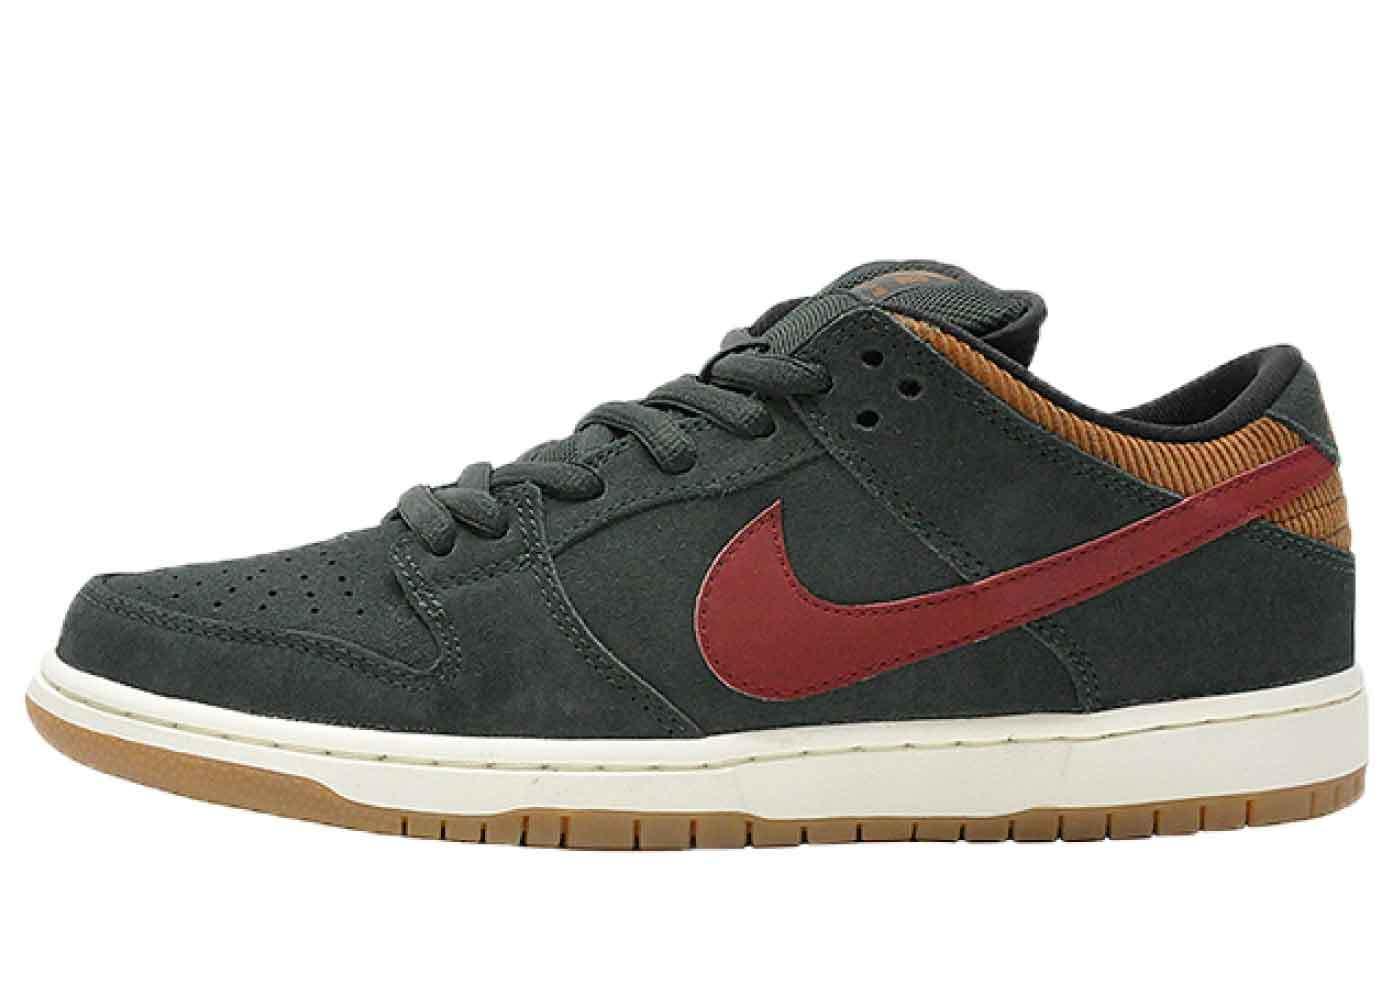 Nike Dunk SB Low Corduroy Ale Brownの写真